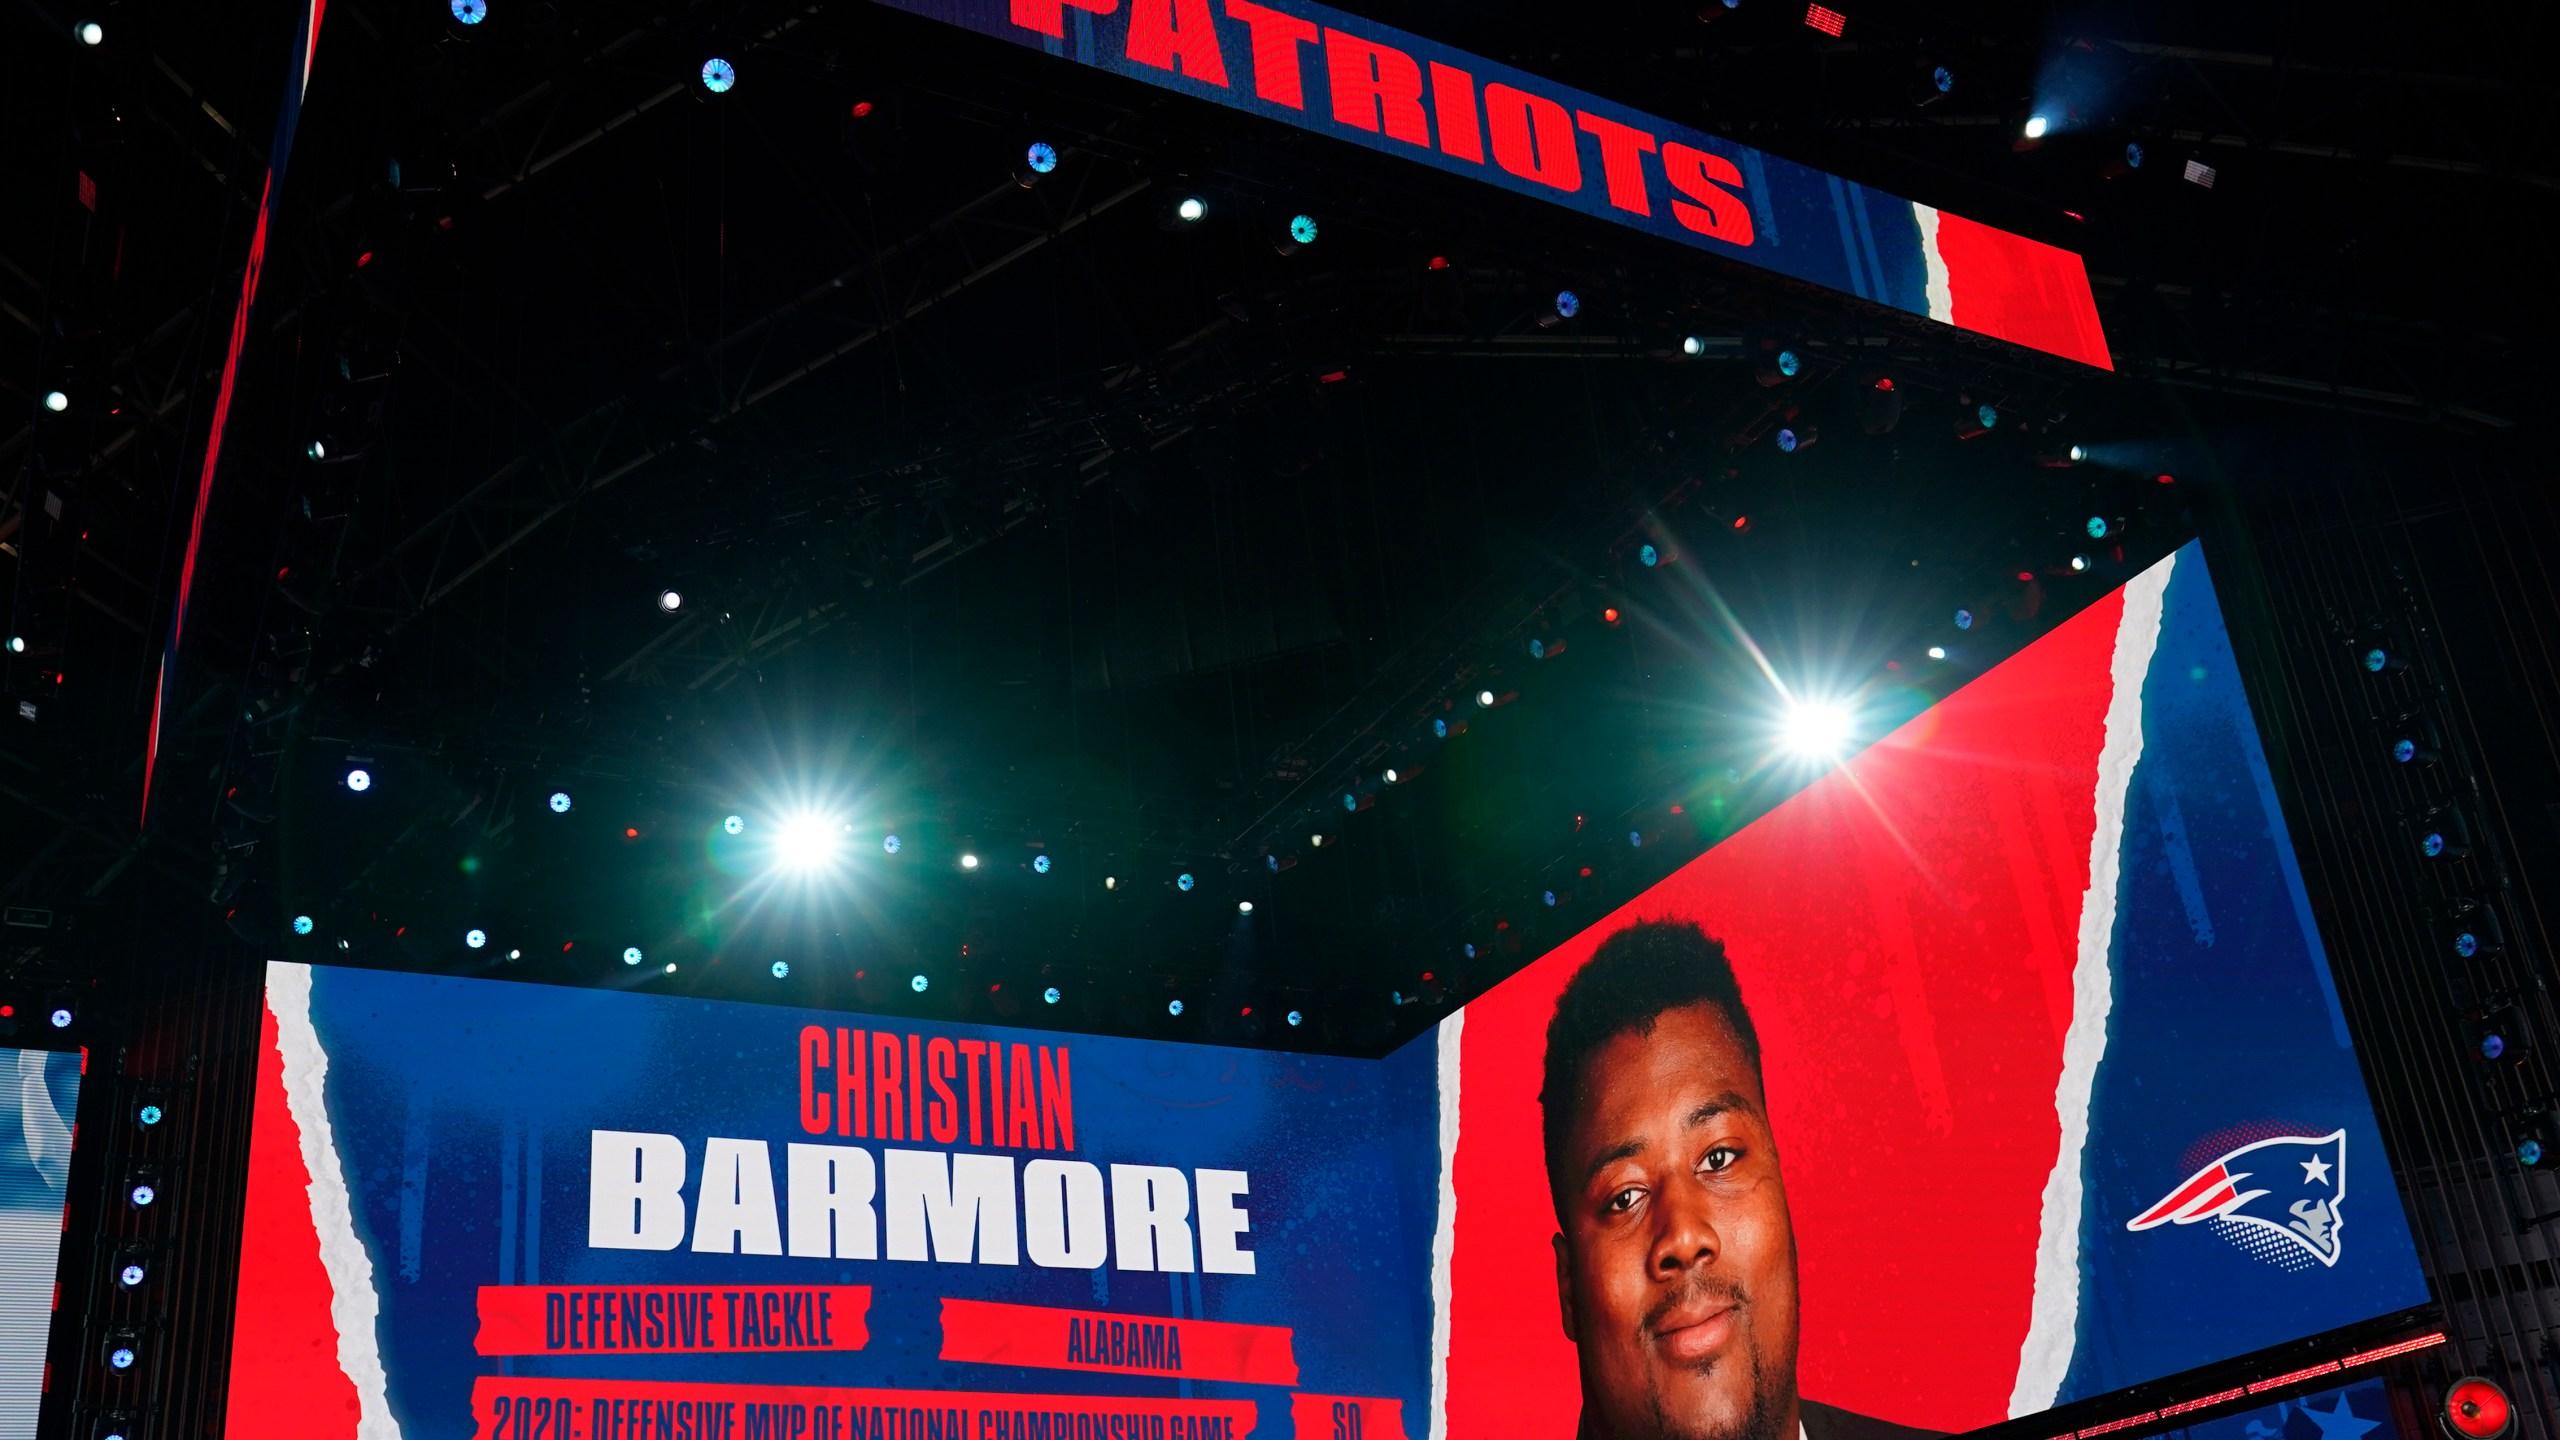 Christian Barmore